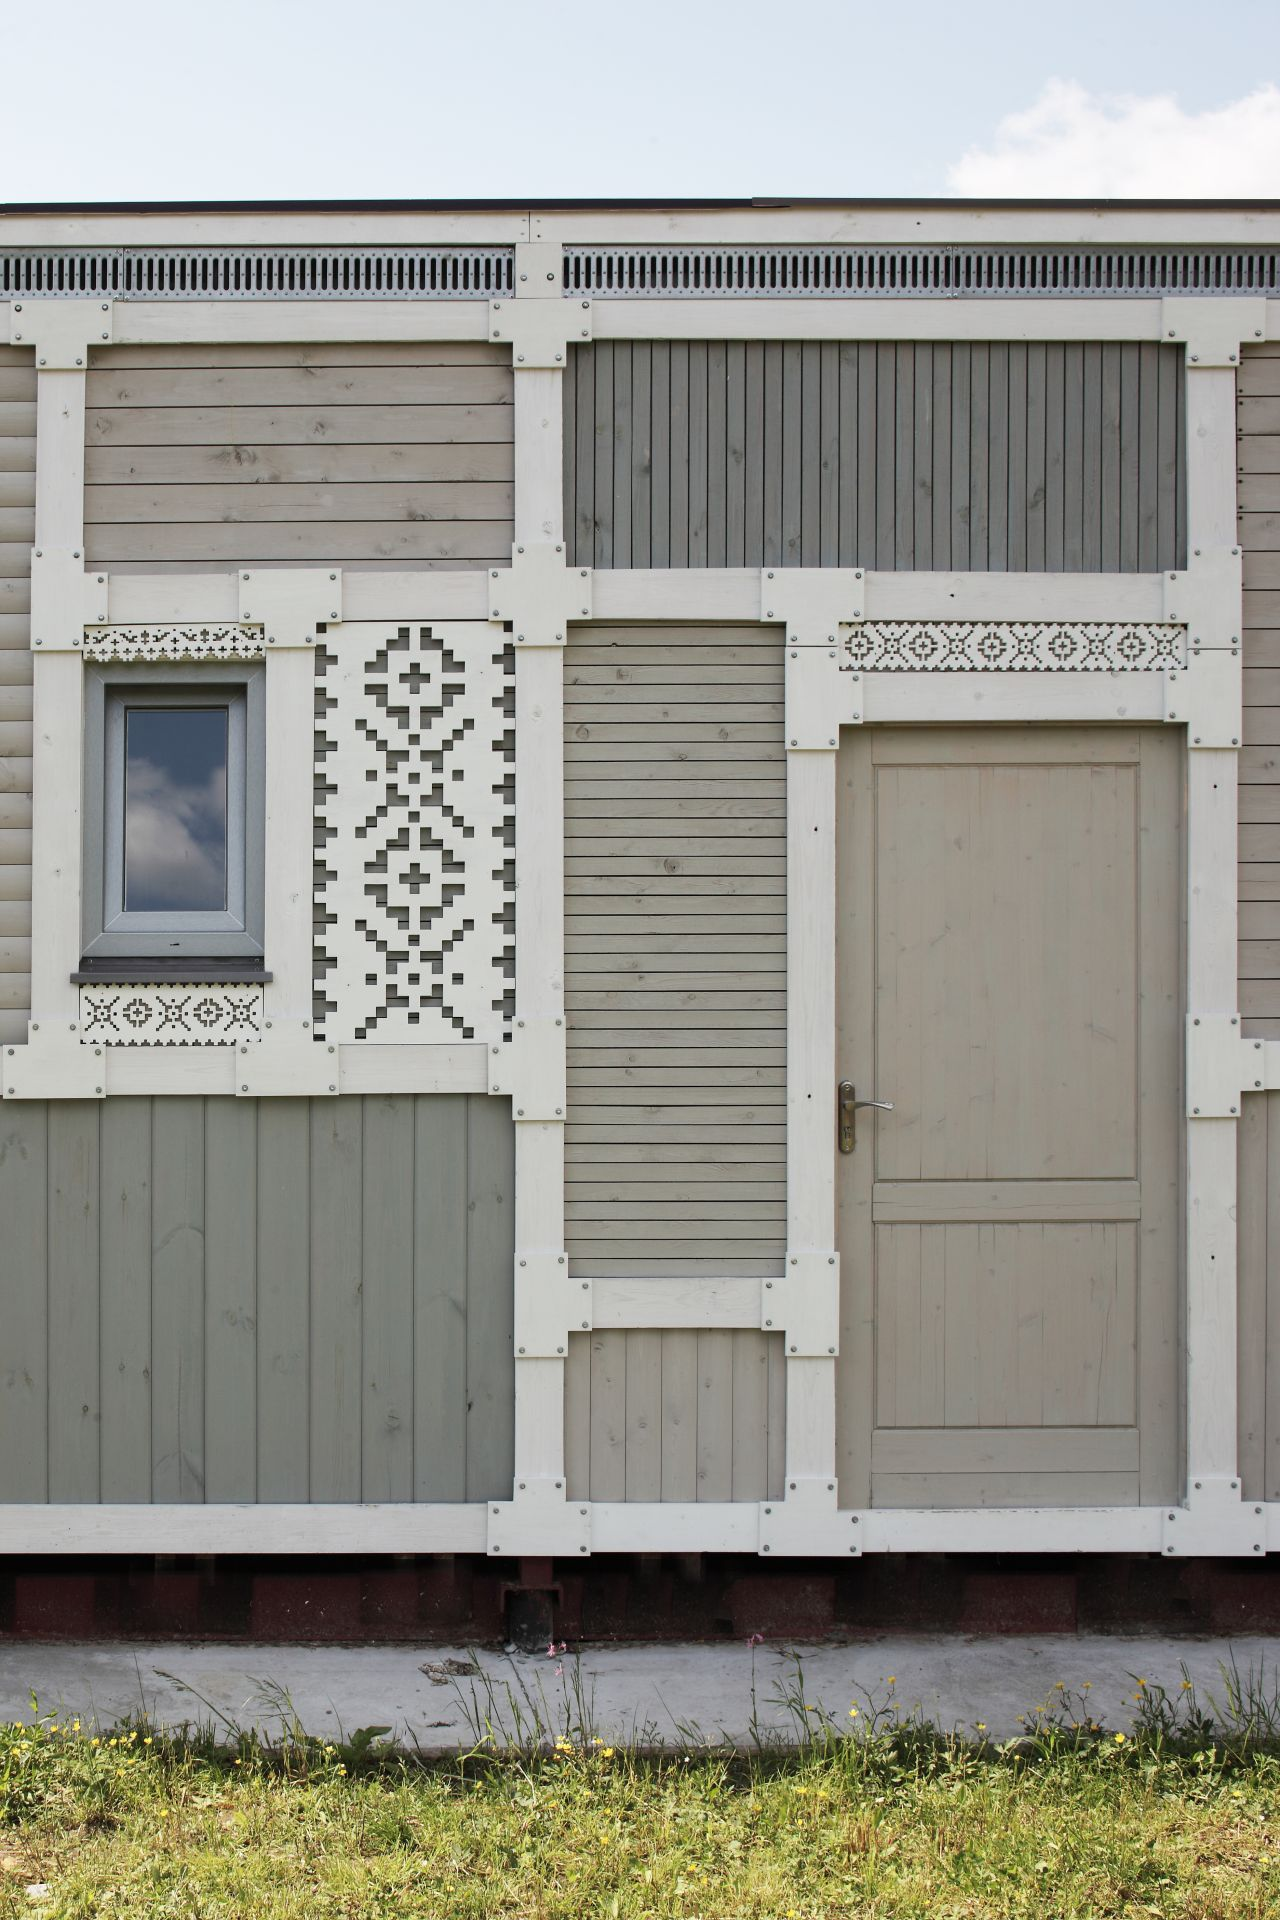 51ef0de6e8e44e94e50000ab_deco-pattern-house-peter-kostelov_kostelov_deco_pattern_facade_015